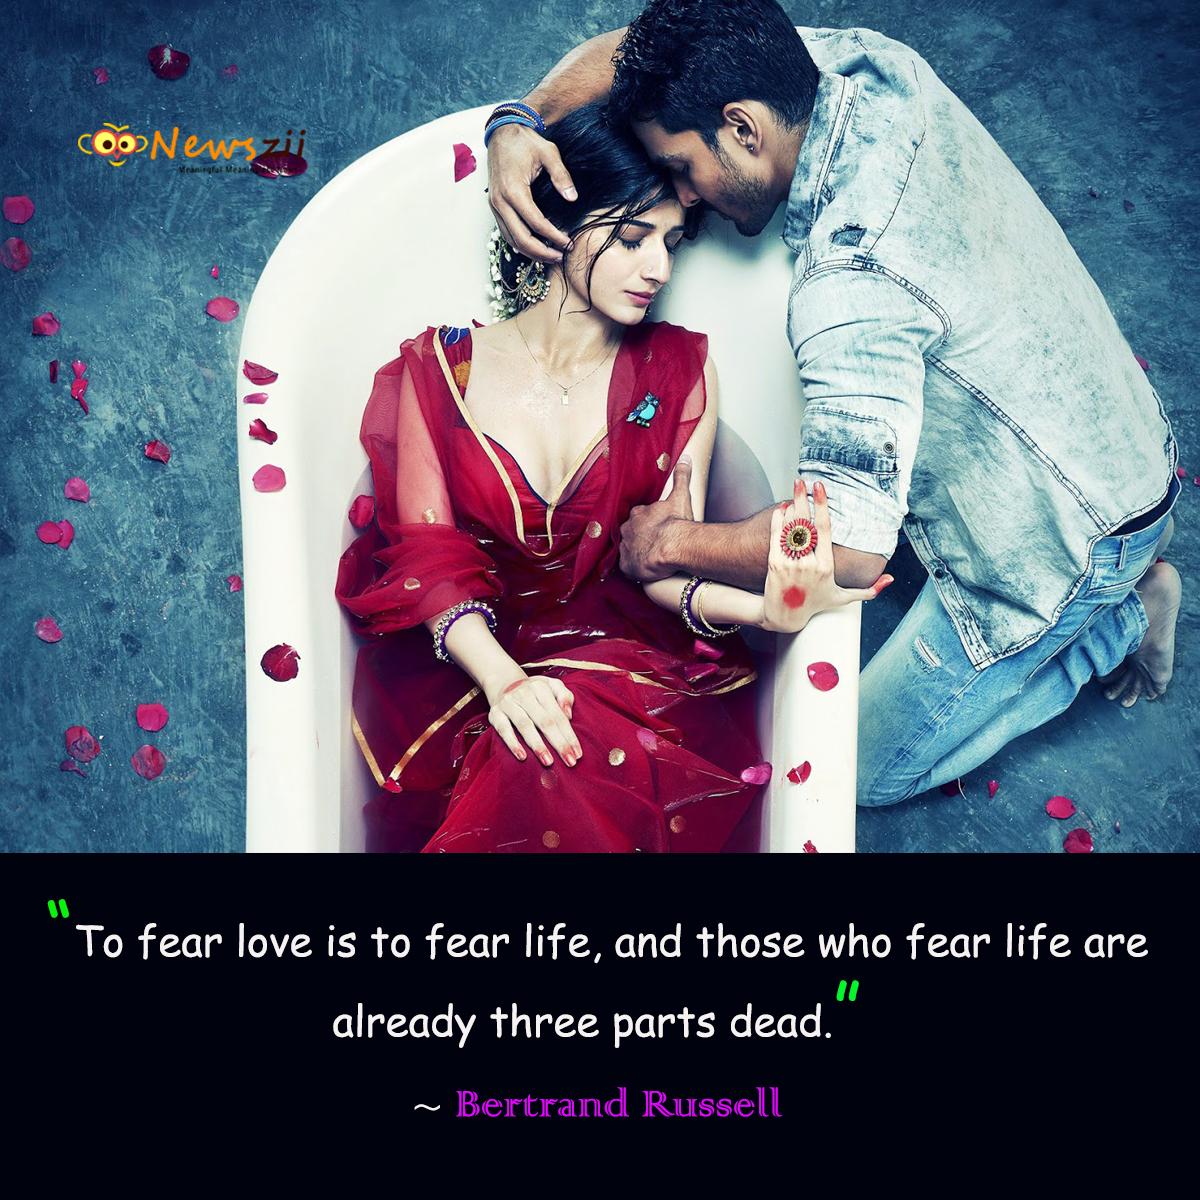 valentines-day-romantic-love-quotes-v106